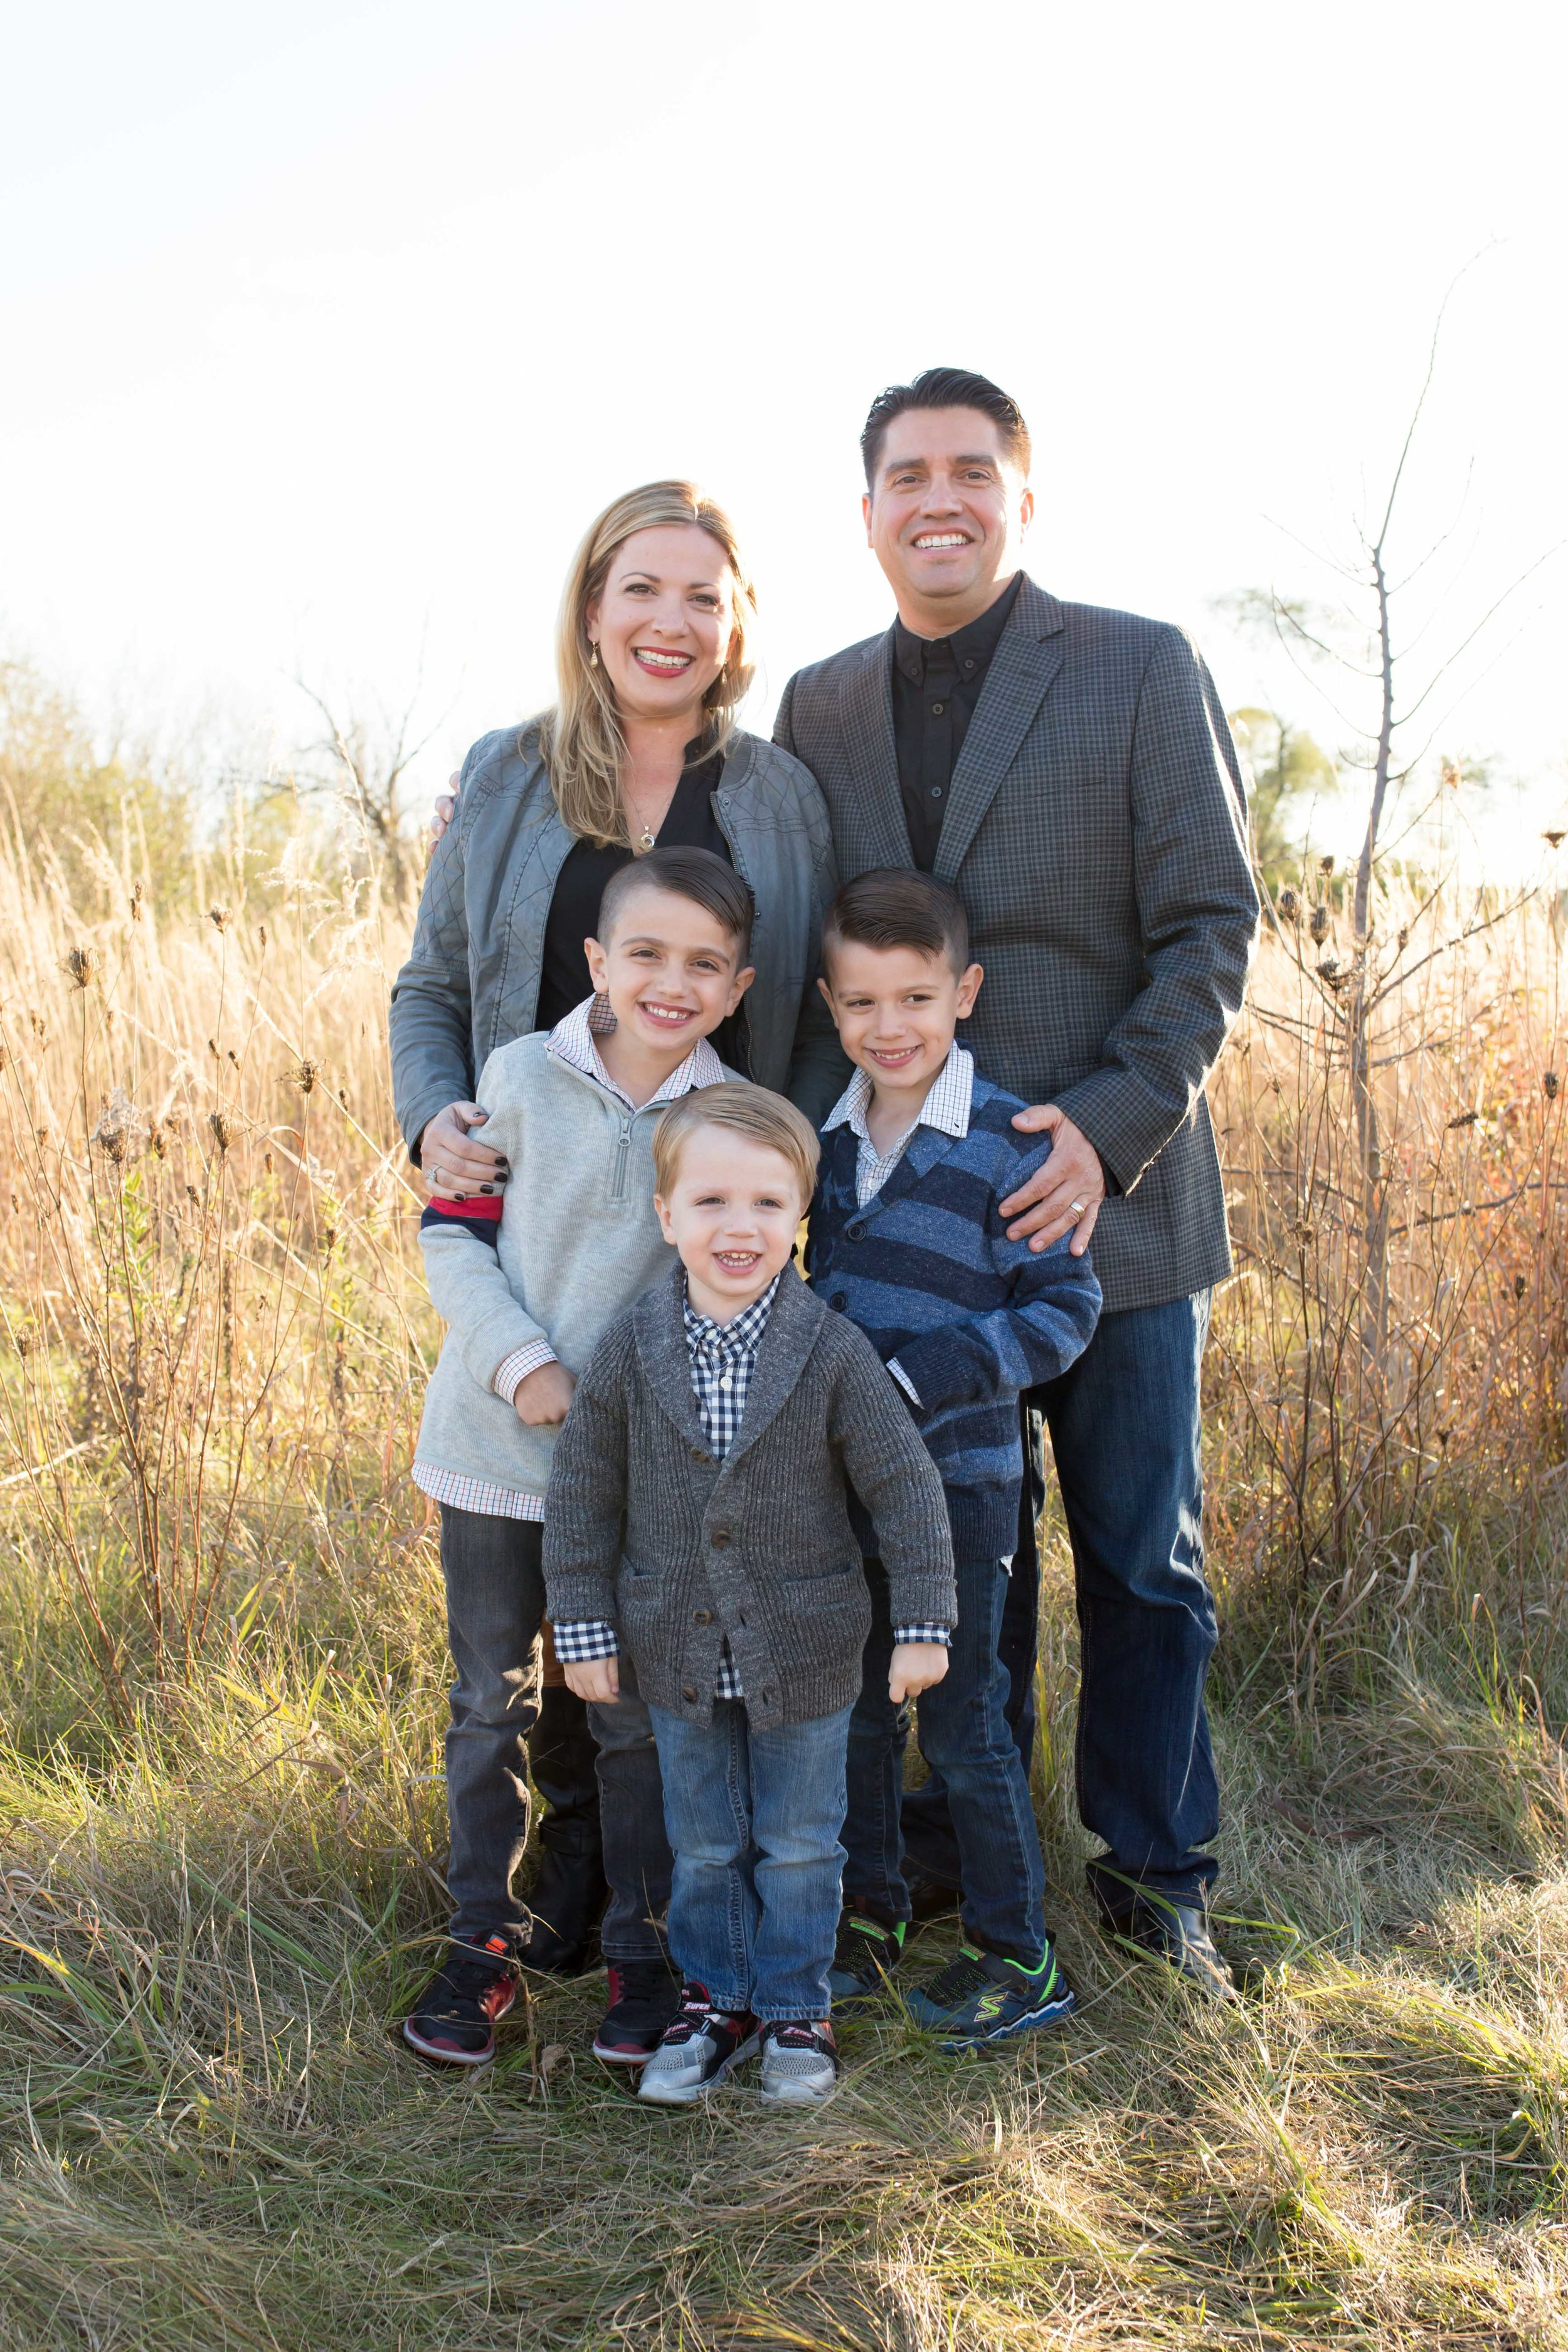 Wheatonfamilyminisession-1.jpg